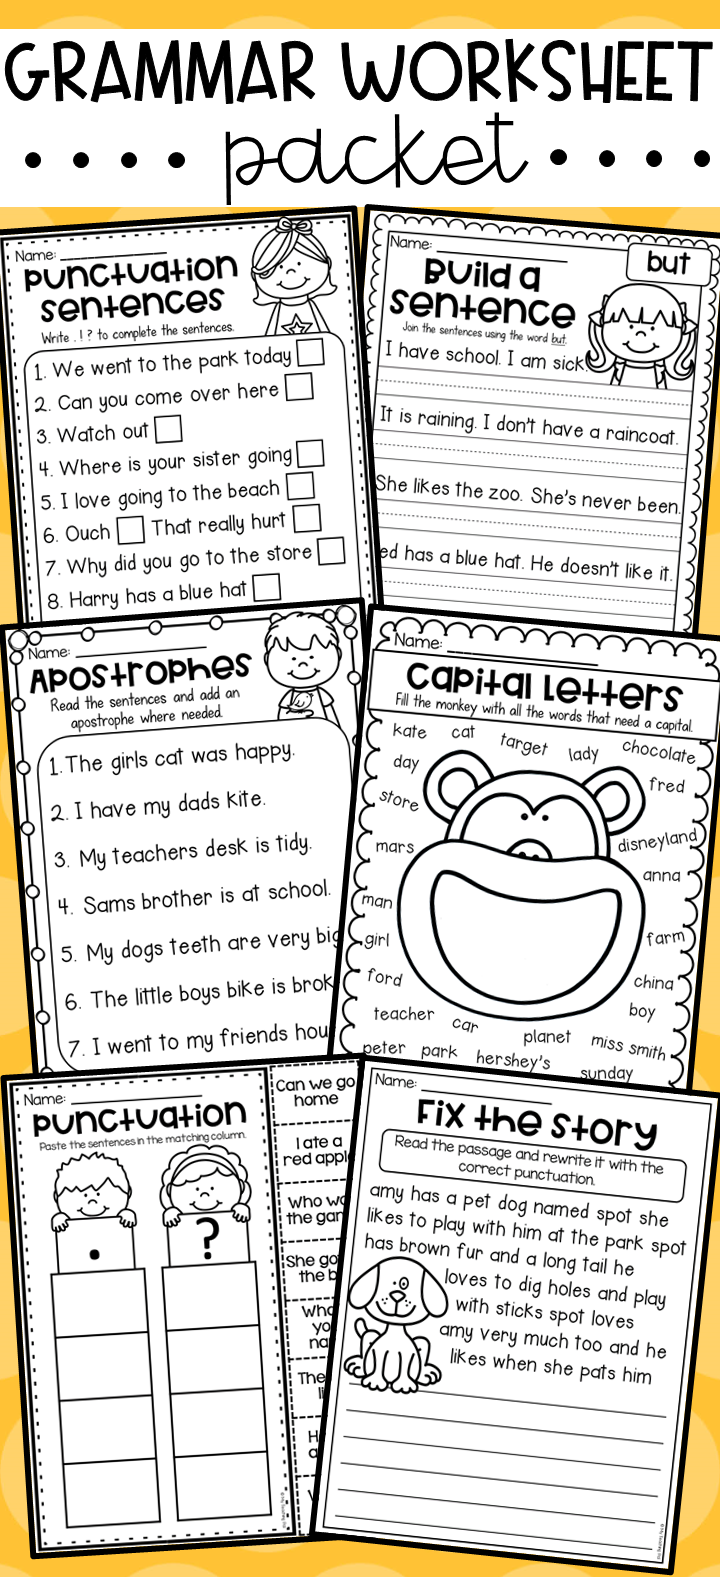 Grammar worksheets for punctuation [ 1577 x 720 Pixel ]